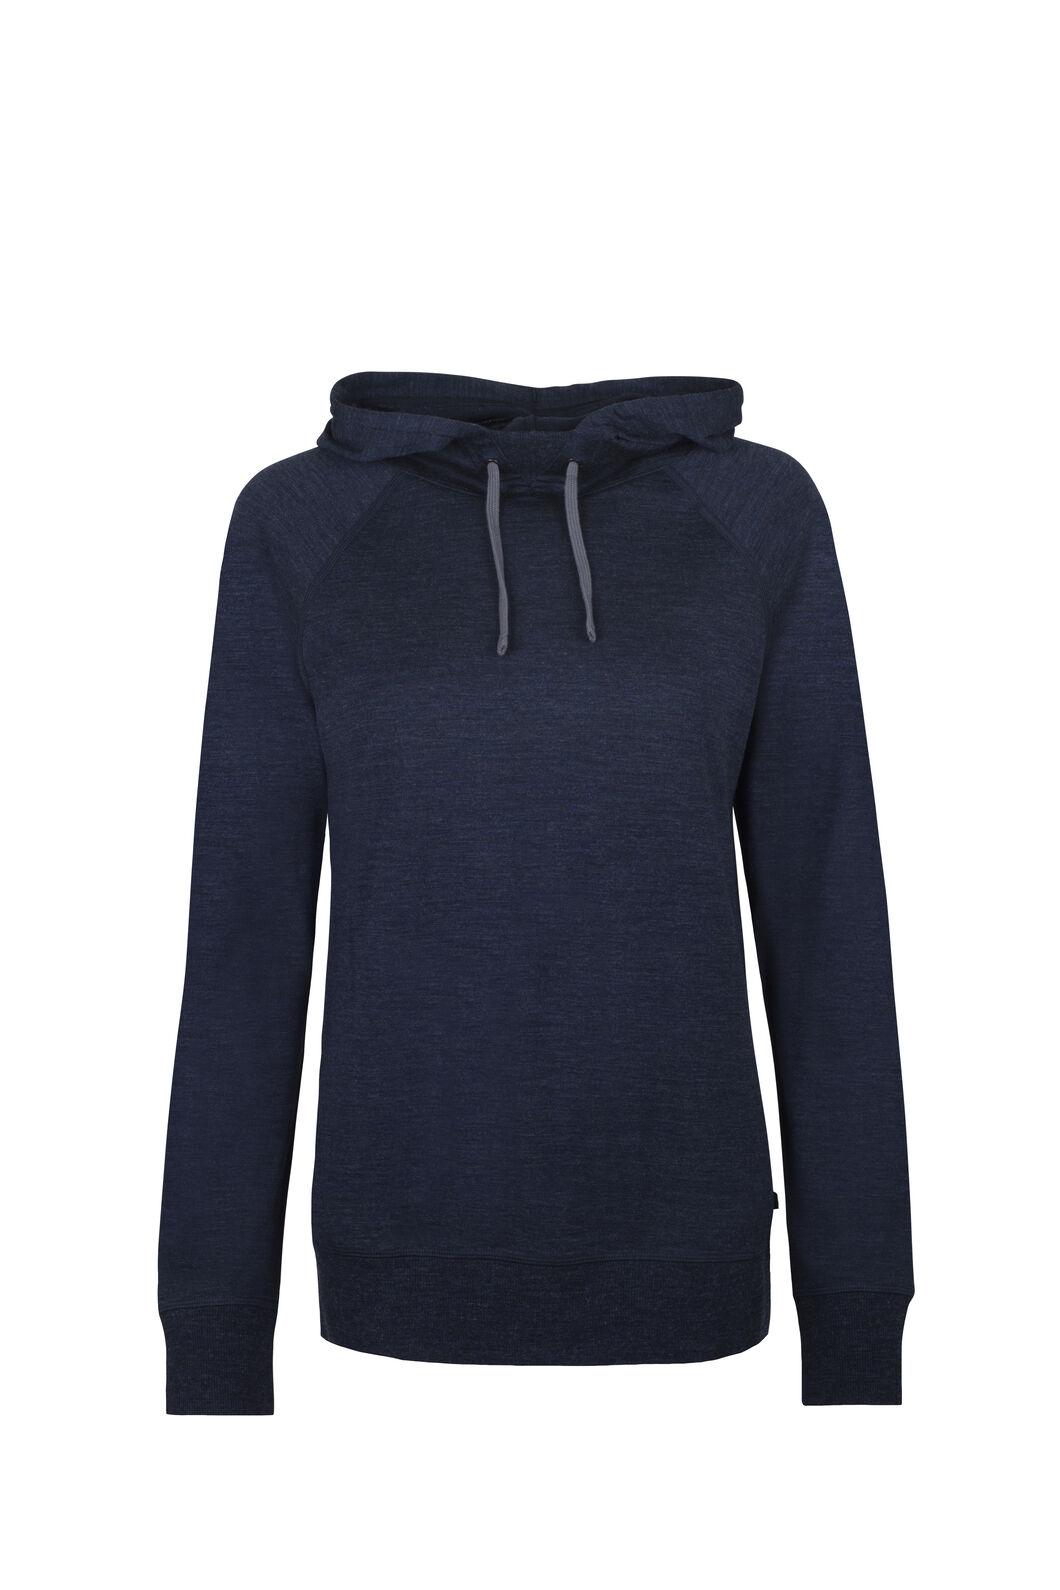 Macpac Skyline Pullover Hoody - Women's, Salute, hi-res